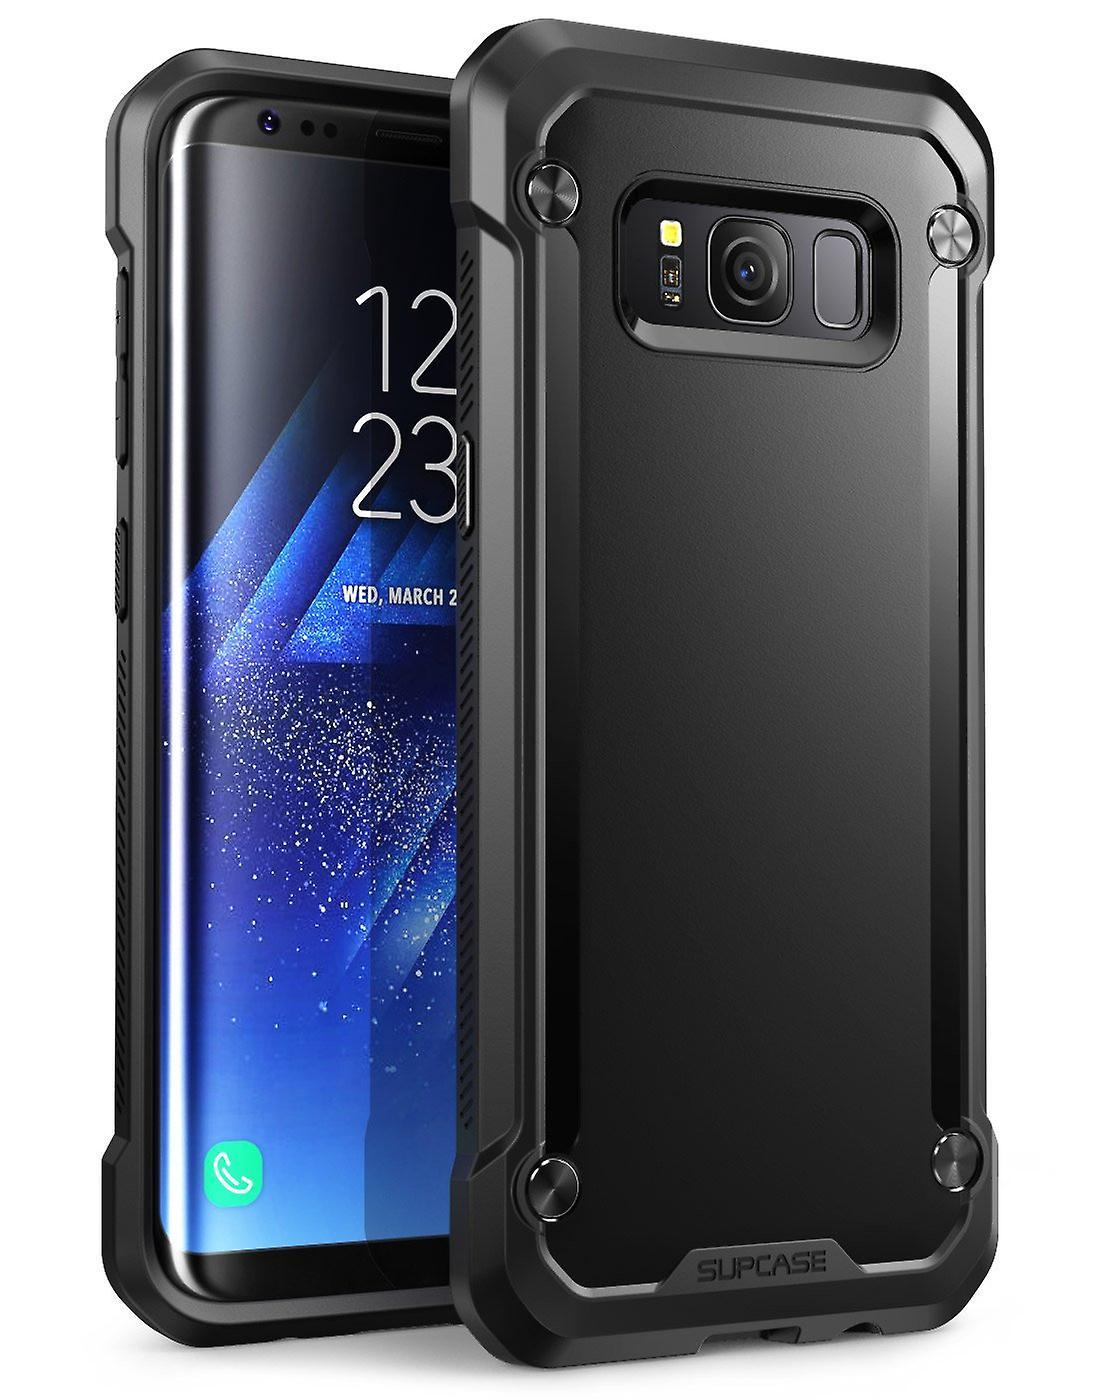 Samsung Galaxy S8 Case, SUPCASE, Unicorn Beetle Series Premium Hybrid Protective Clear Case, S8 Case. Samsung S8 Case